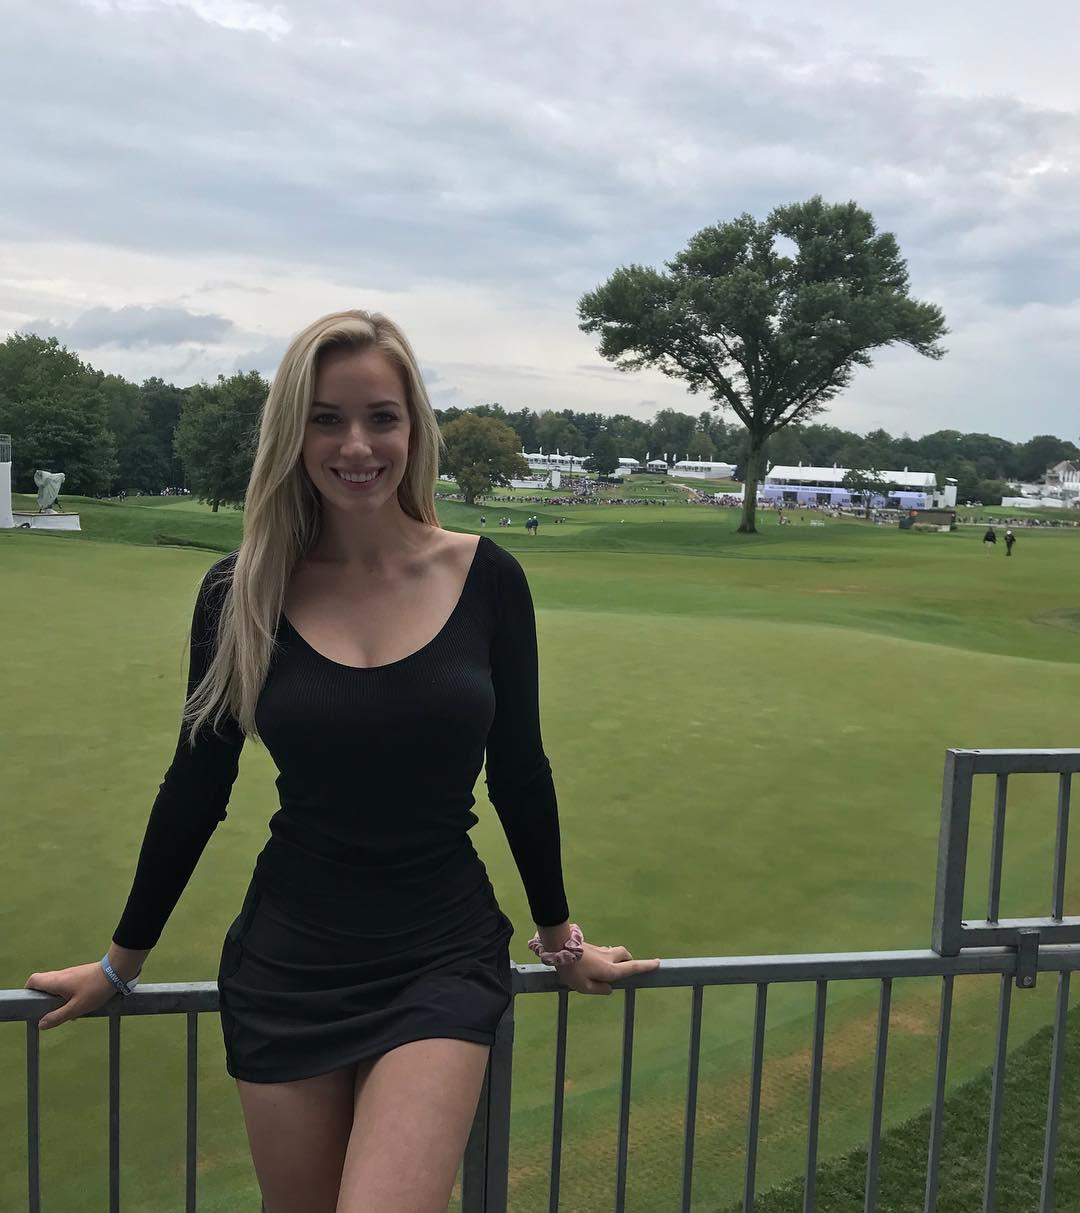 Appealing tips for paige spiranac lpga, Ladies European Tour